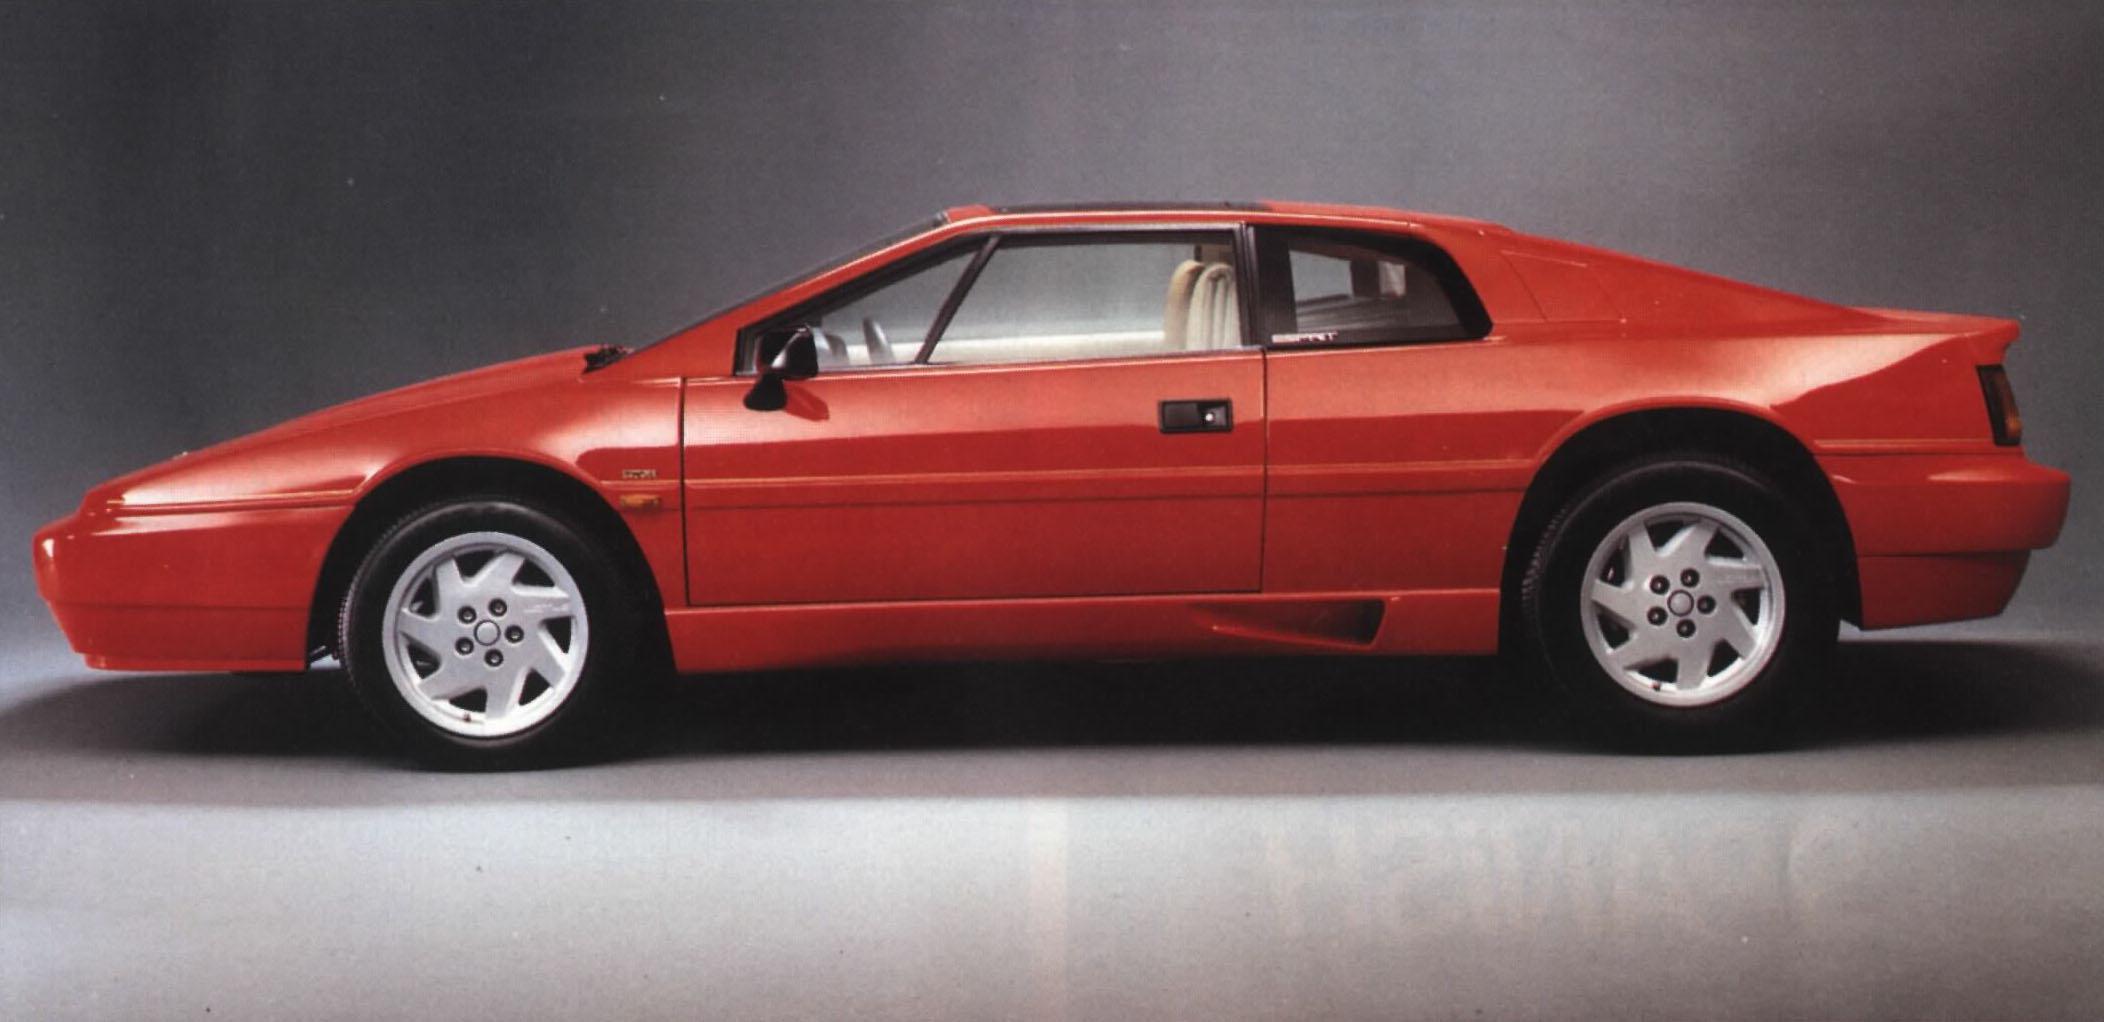 Lotus Esprit IV 1987 - 1993 Coupe #2